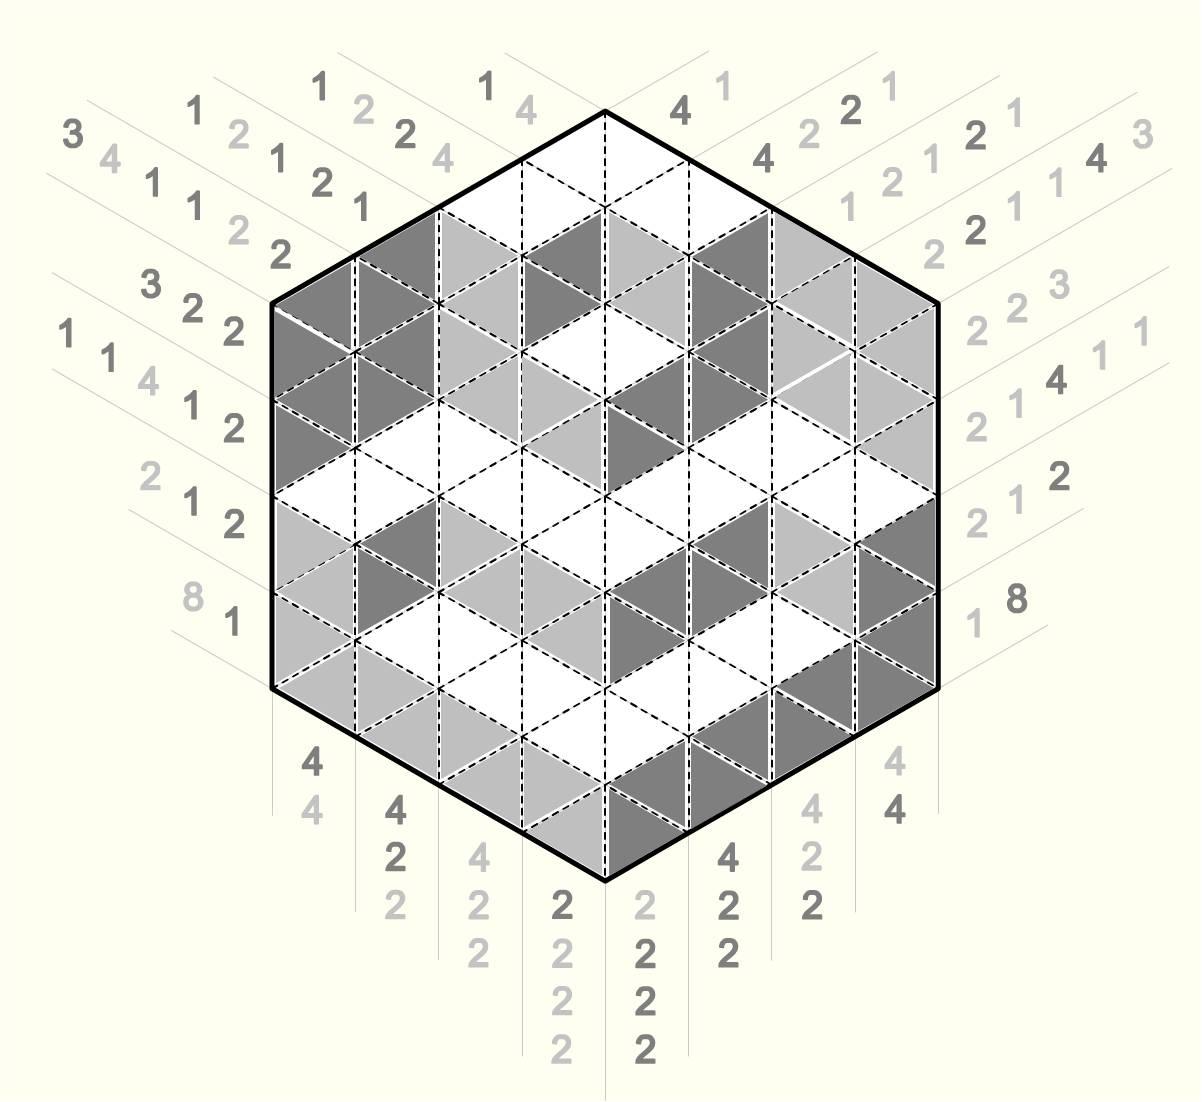 http://www.prise2tete.fr/upload/Klimrod-00-Friz-Fr3edom.jpg